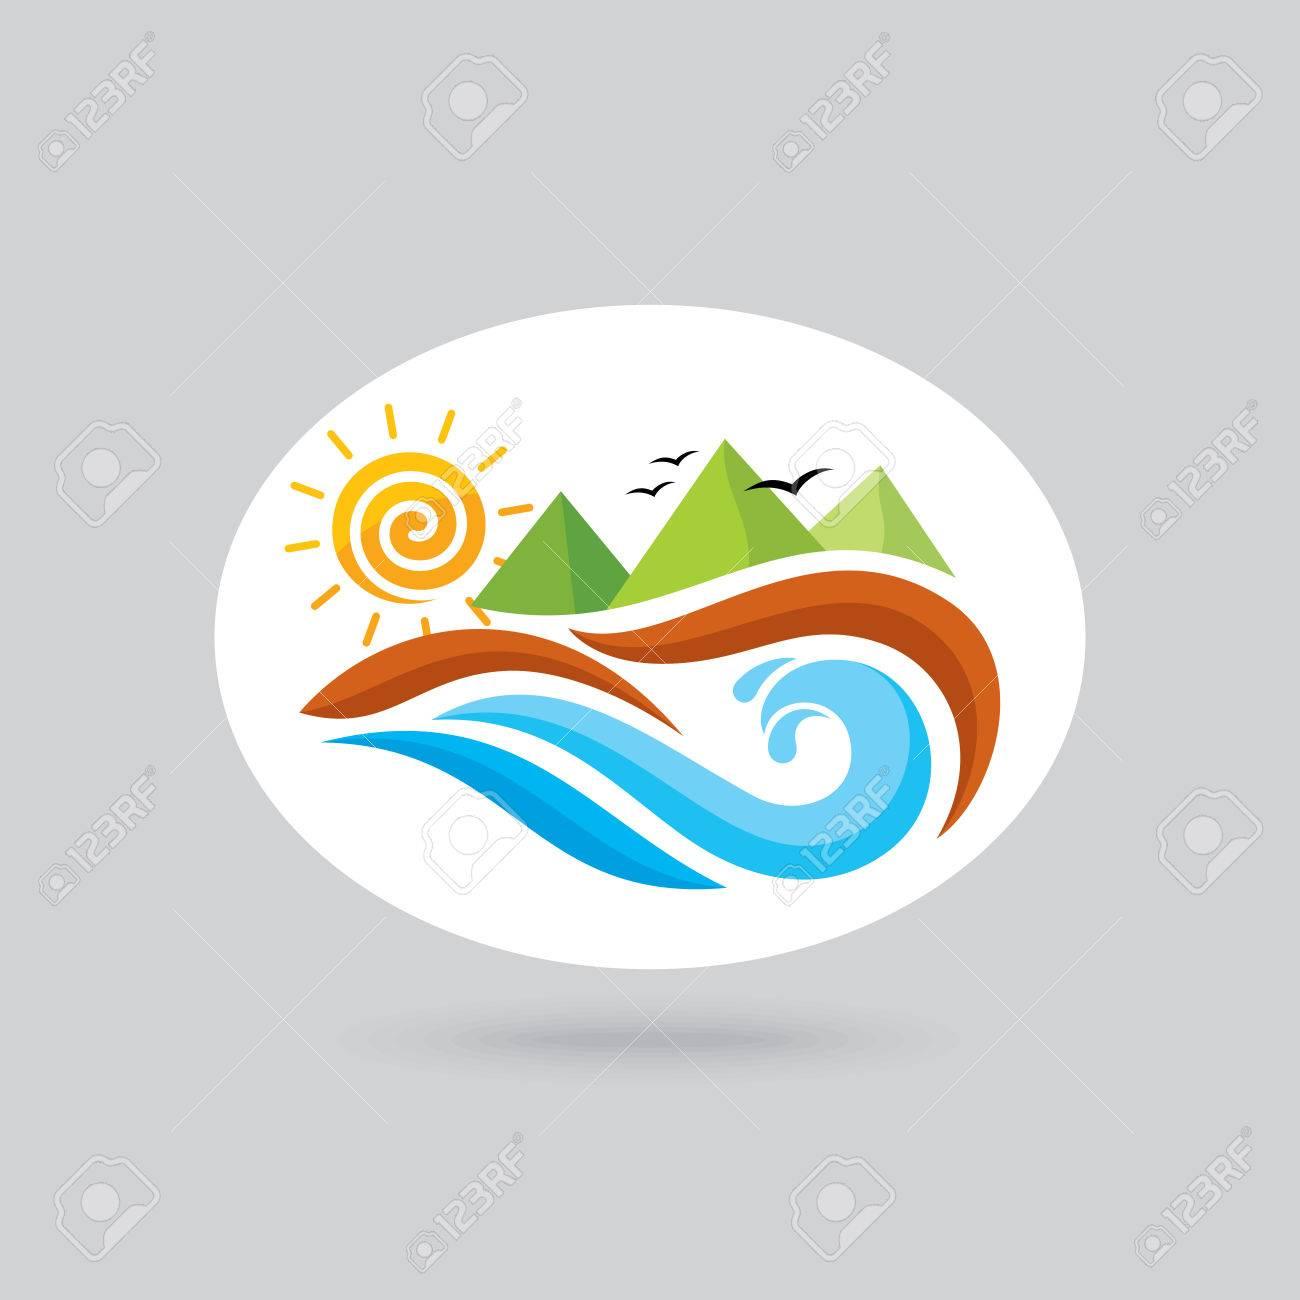 Logo for ocean view resort logo design vector illustration logo for ocean view resort logo design vector illustration stock vector 61462506 biocorpaavc Gallery